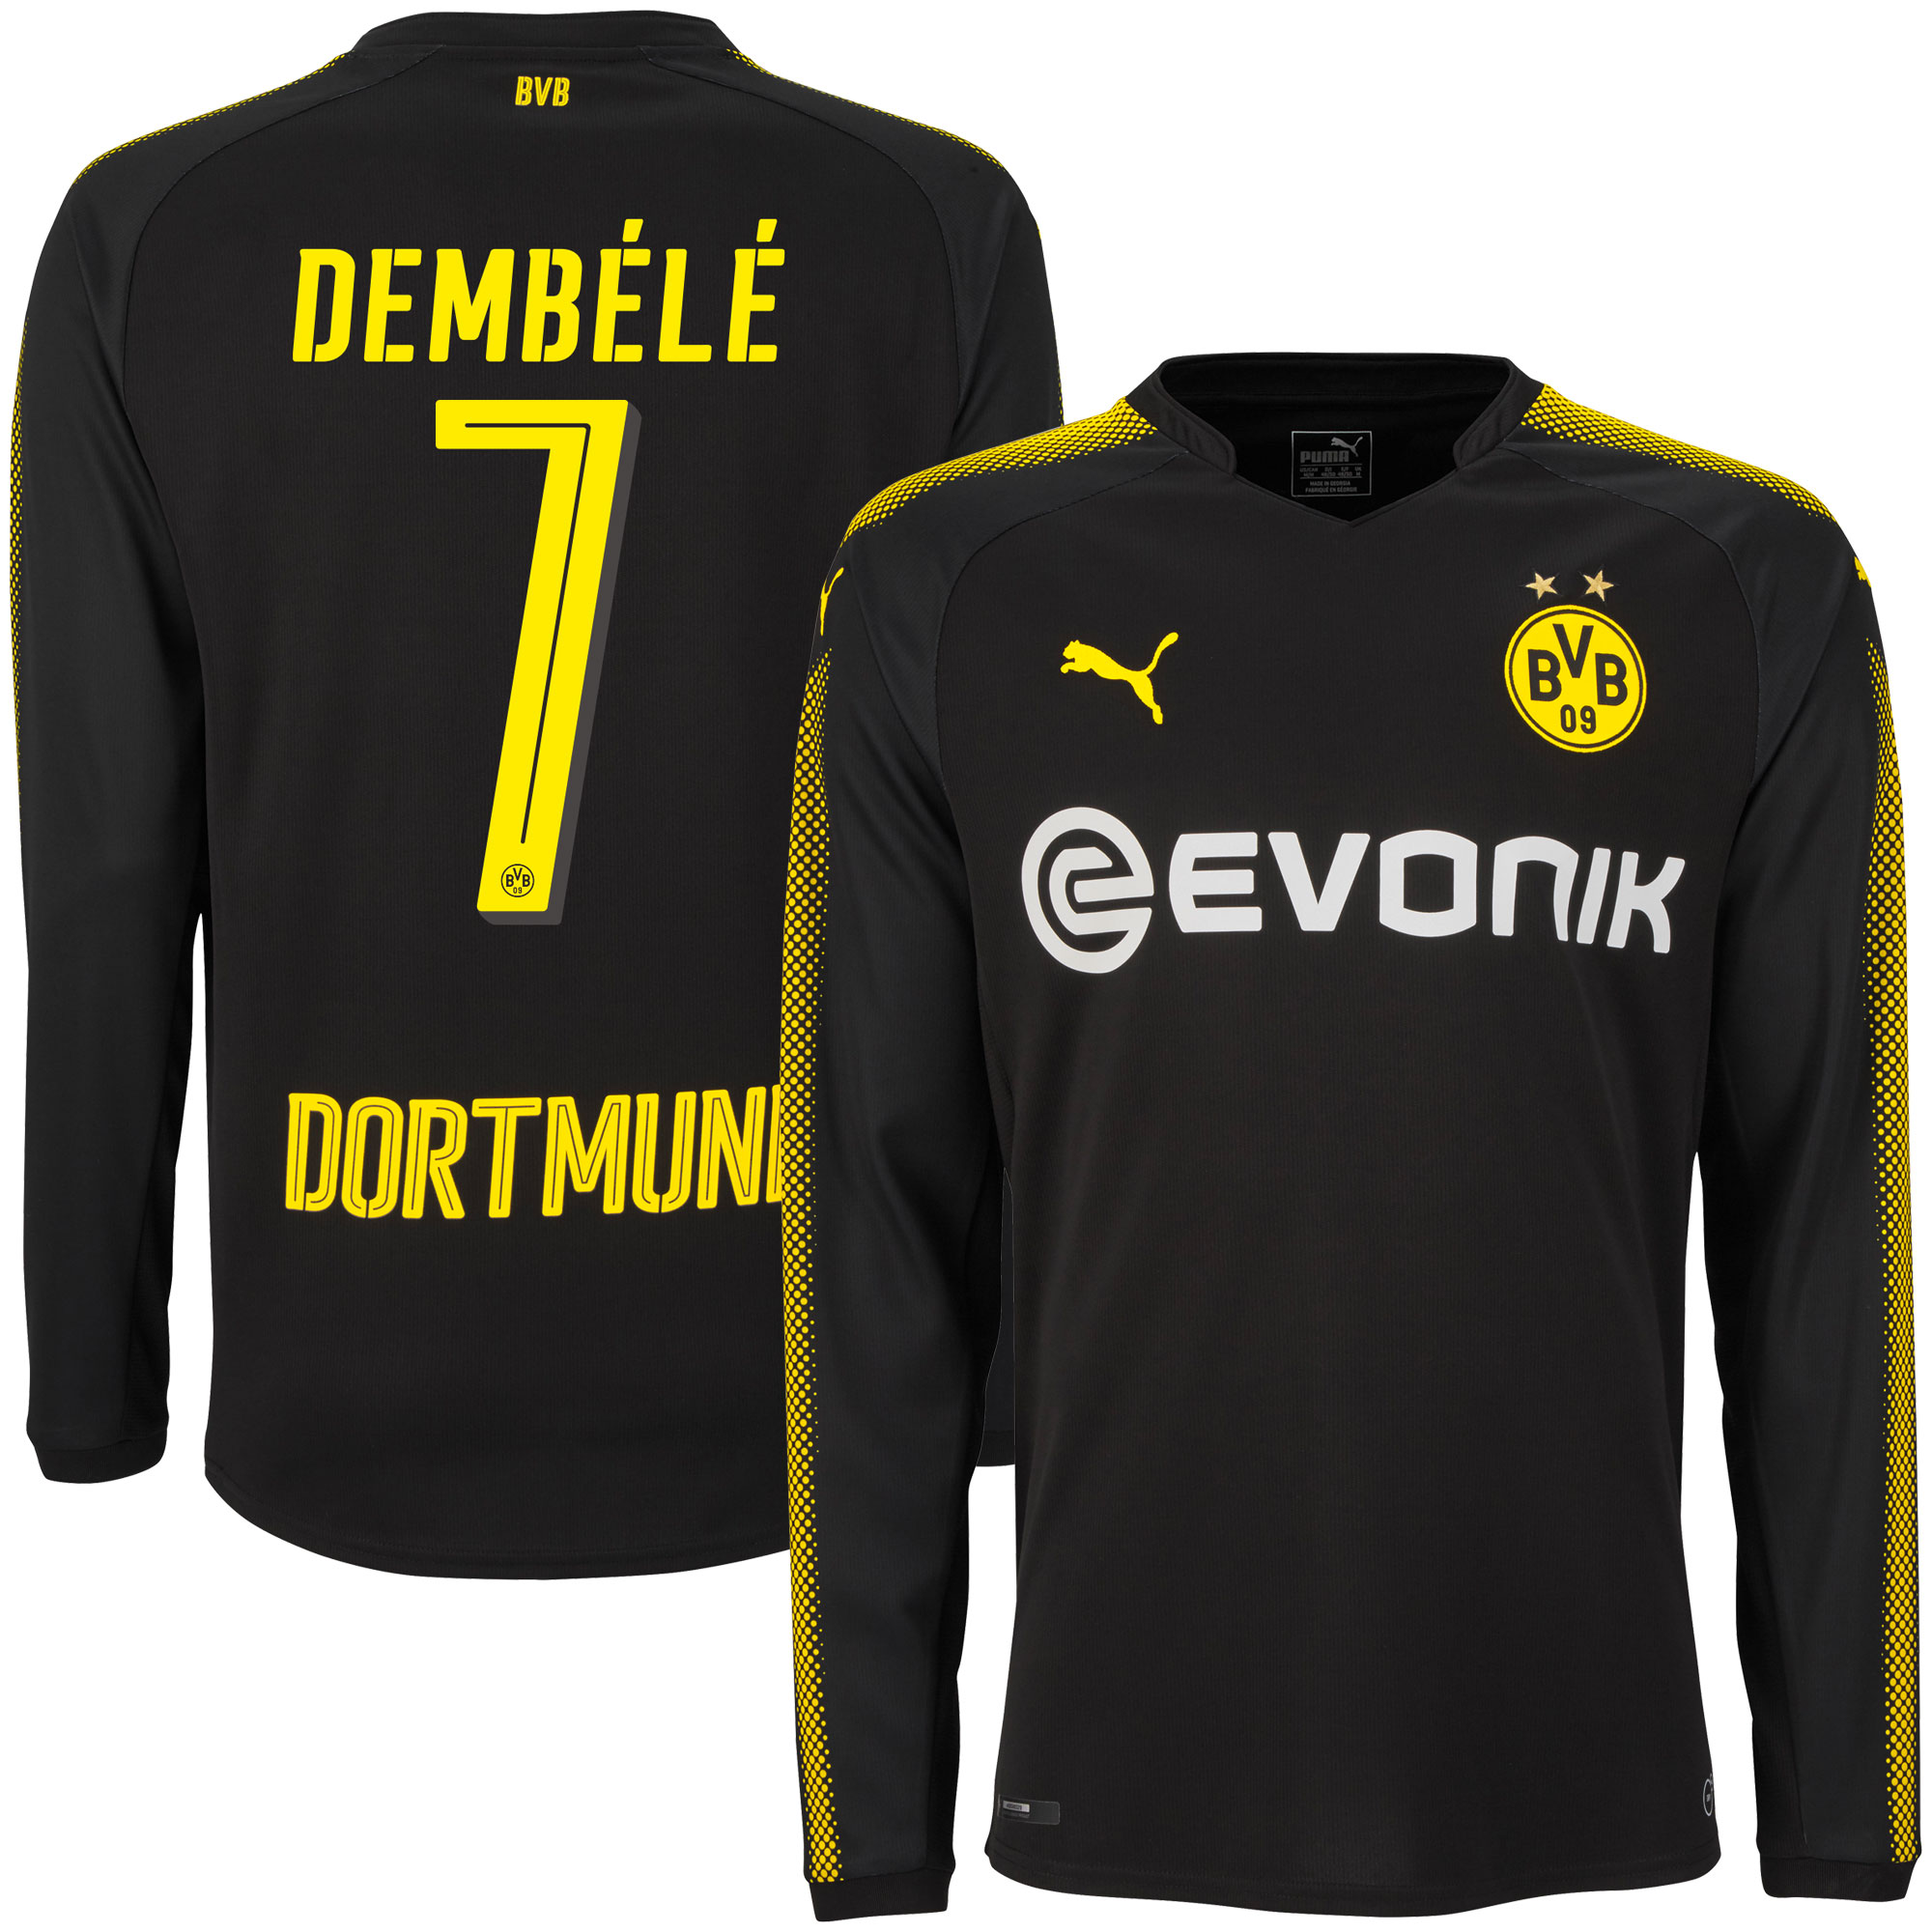 Borussia Dortmund Away L/S Dembélé Jersey 2017 / 2018 (Official Player Printing) - M